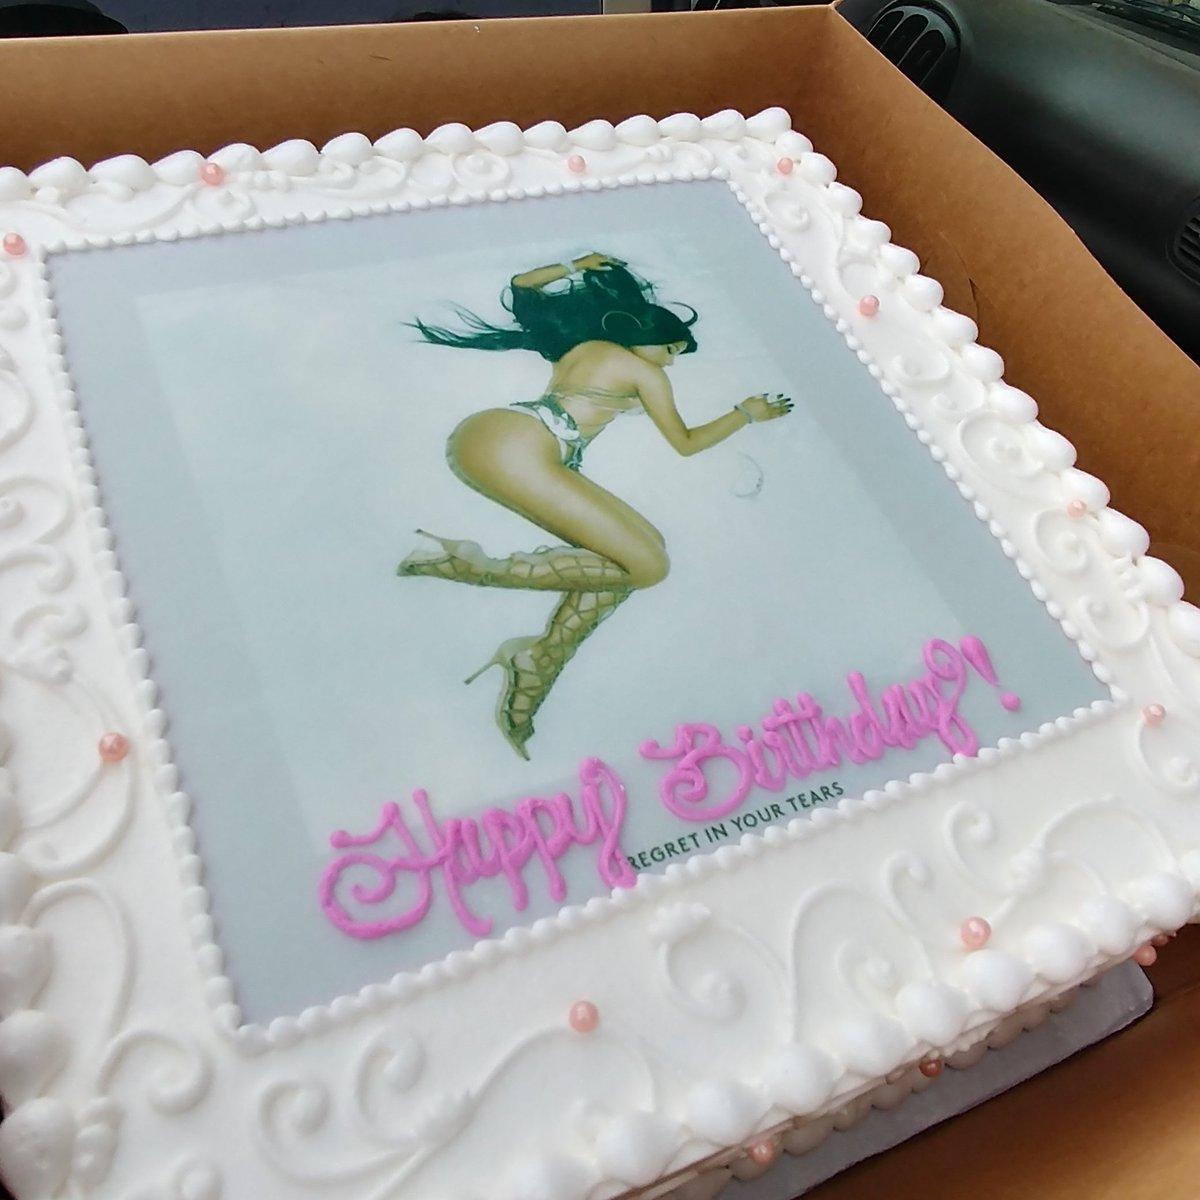 Magnificent Arnold Byrd On Twitter My Daughter Birthday Cake Of Nicki Minaj Personalised Birthday Cards Paralily Jamesorg